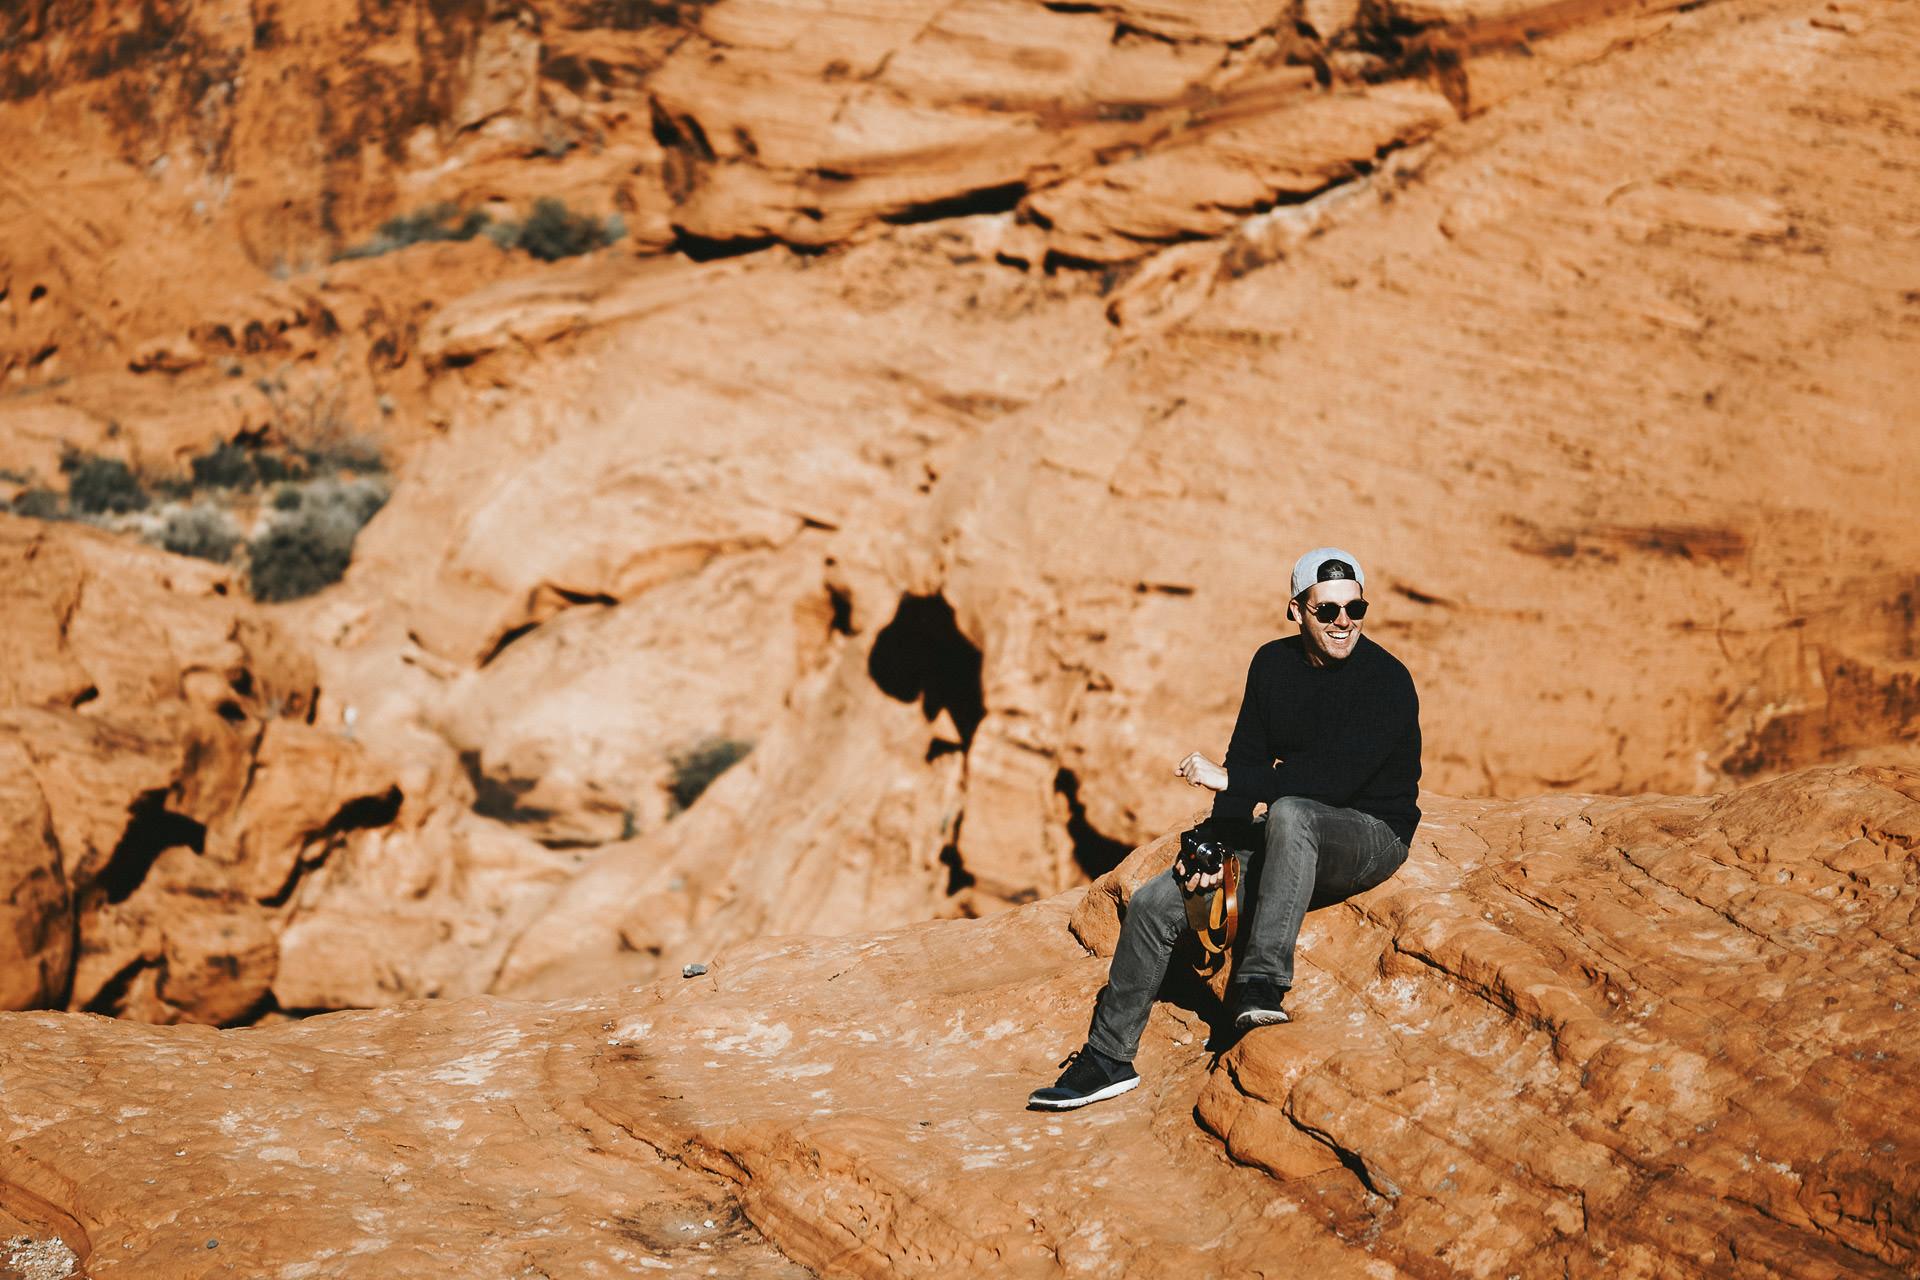 Twisted-Oaks-Studio-wppi-leica-red-rock-canyon-1.jpg